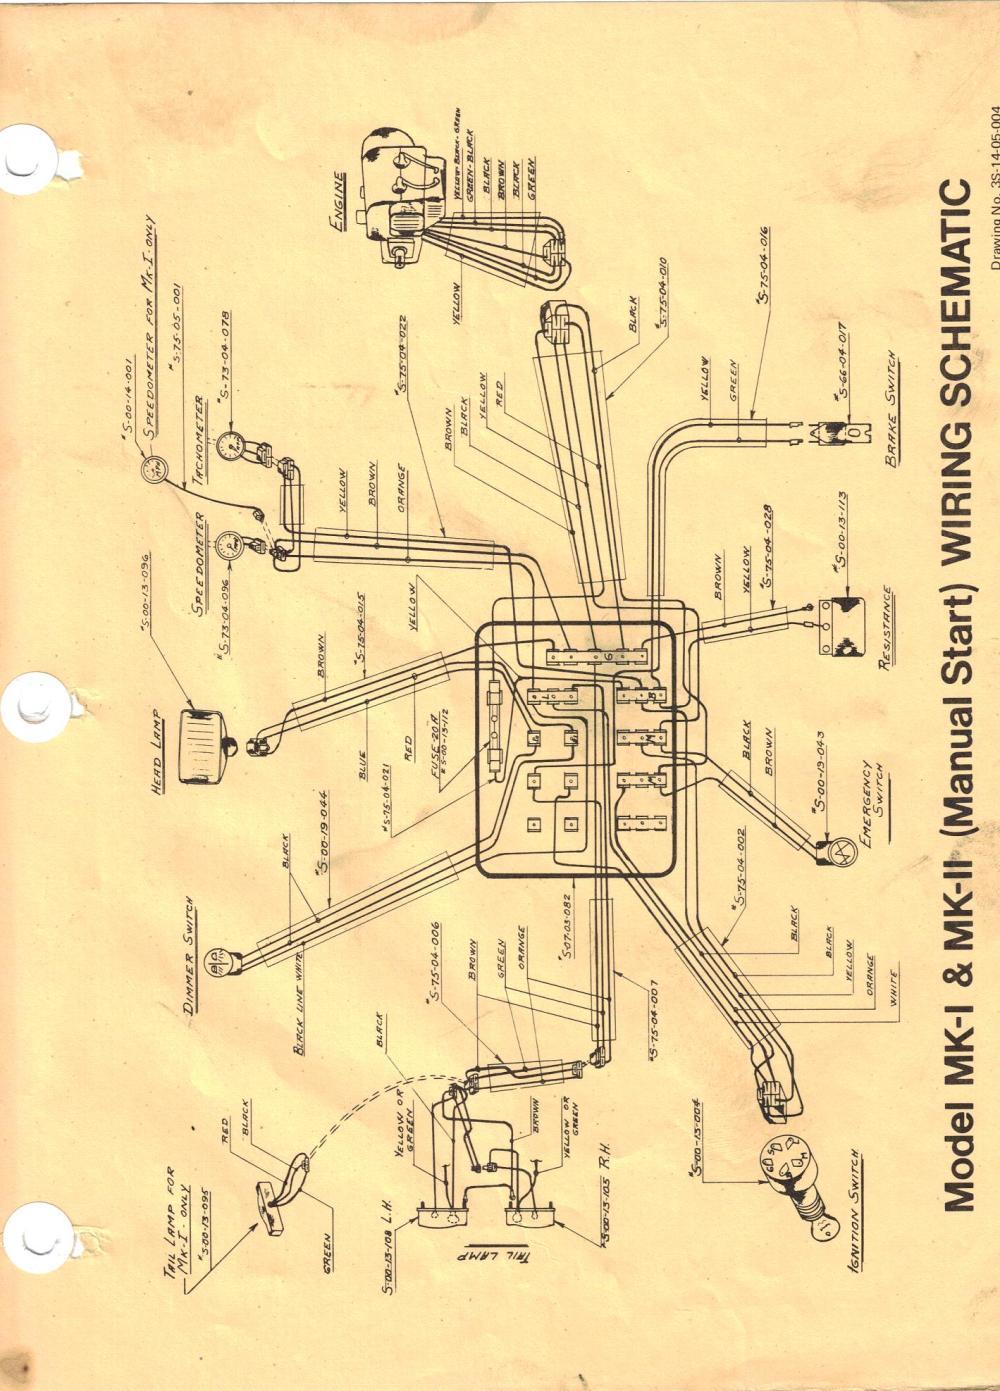 medium resolution of sno way wiring diagram sno get free image about wiring sno way wiring diagram sno way wiring diagram snow way plow